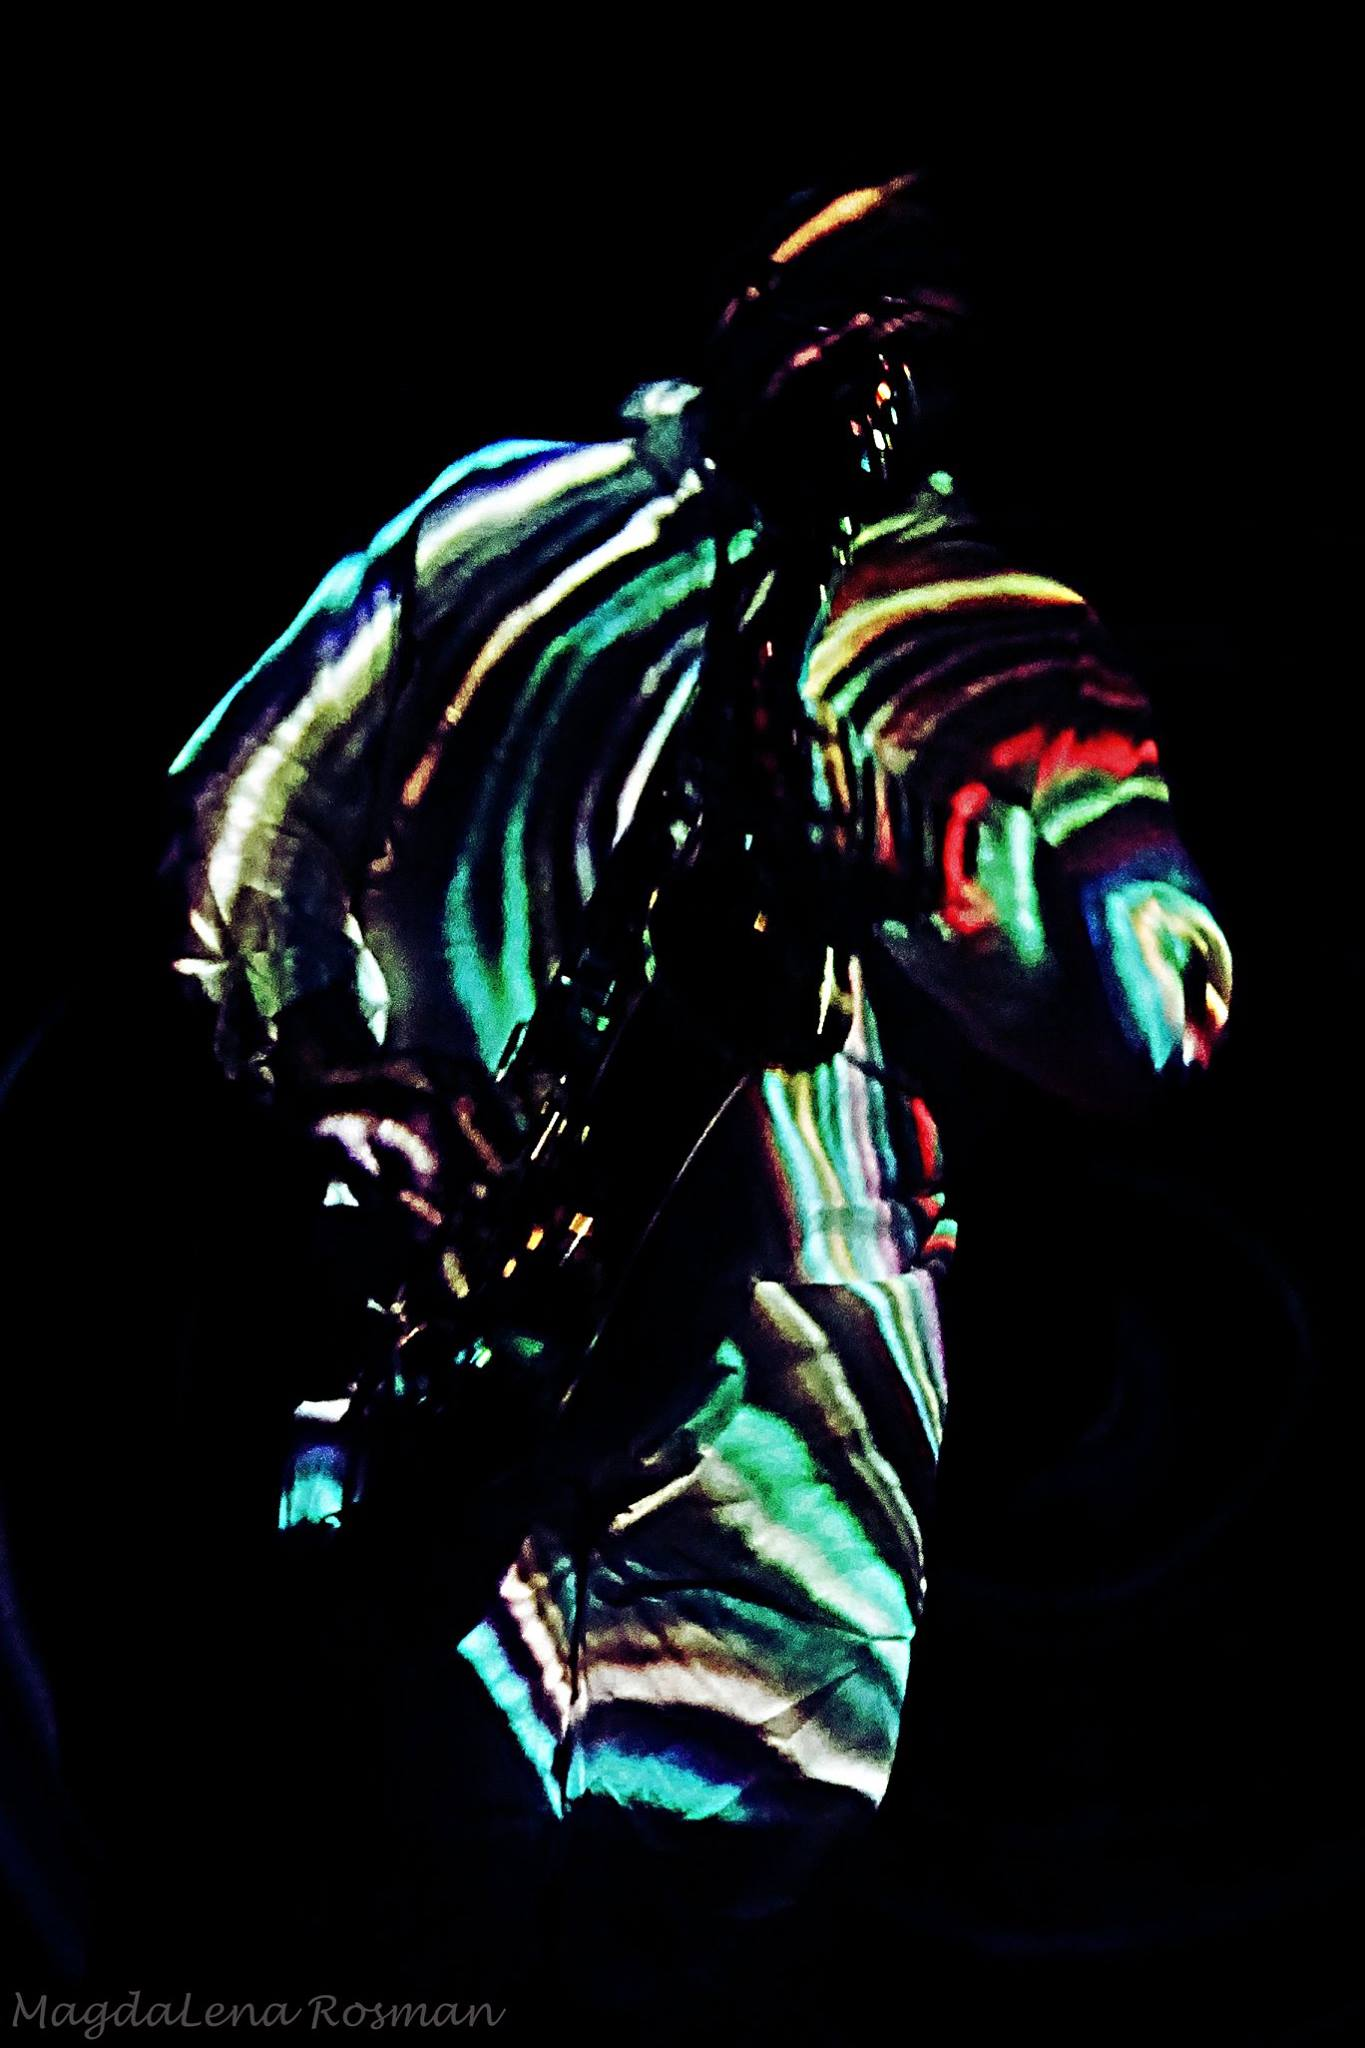 Olbrzym i kurdupel foto: Magdalena Rosman